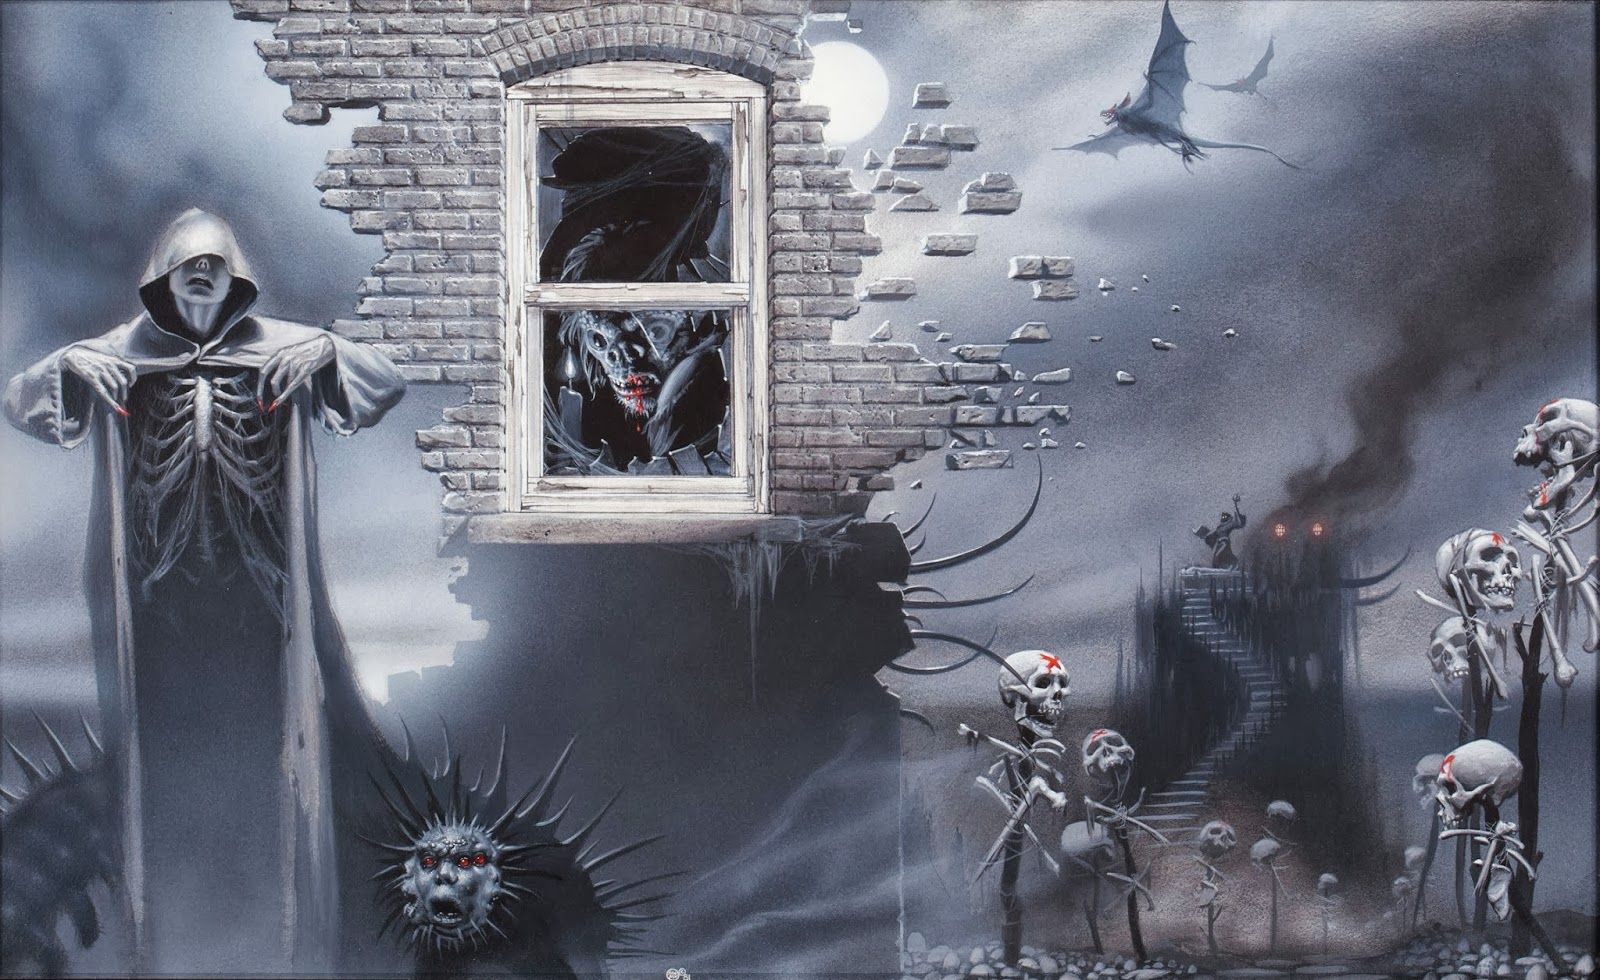 Hp Lovecraft Art Wallpapers: Fantasy Ink: Michael Whelan & H.P. Lovecraft